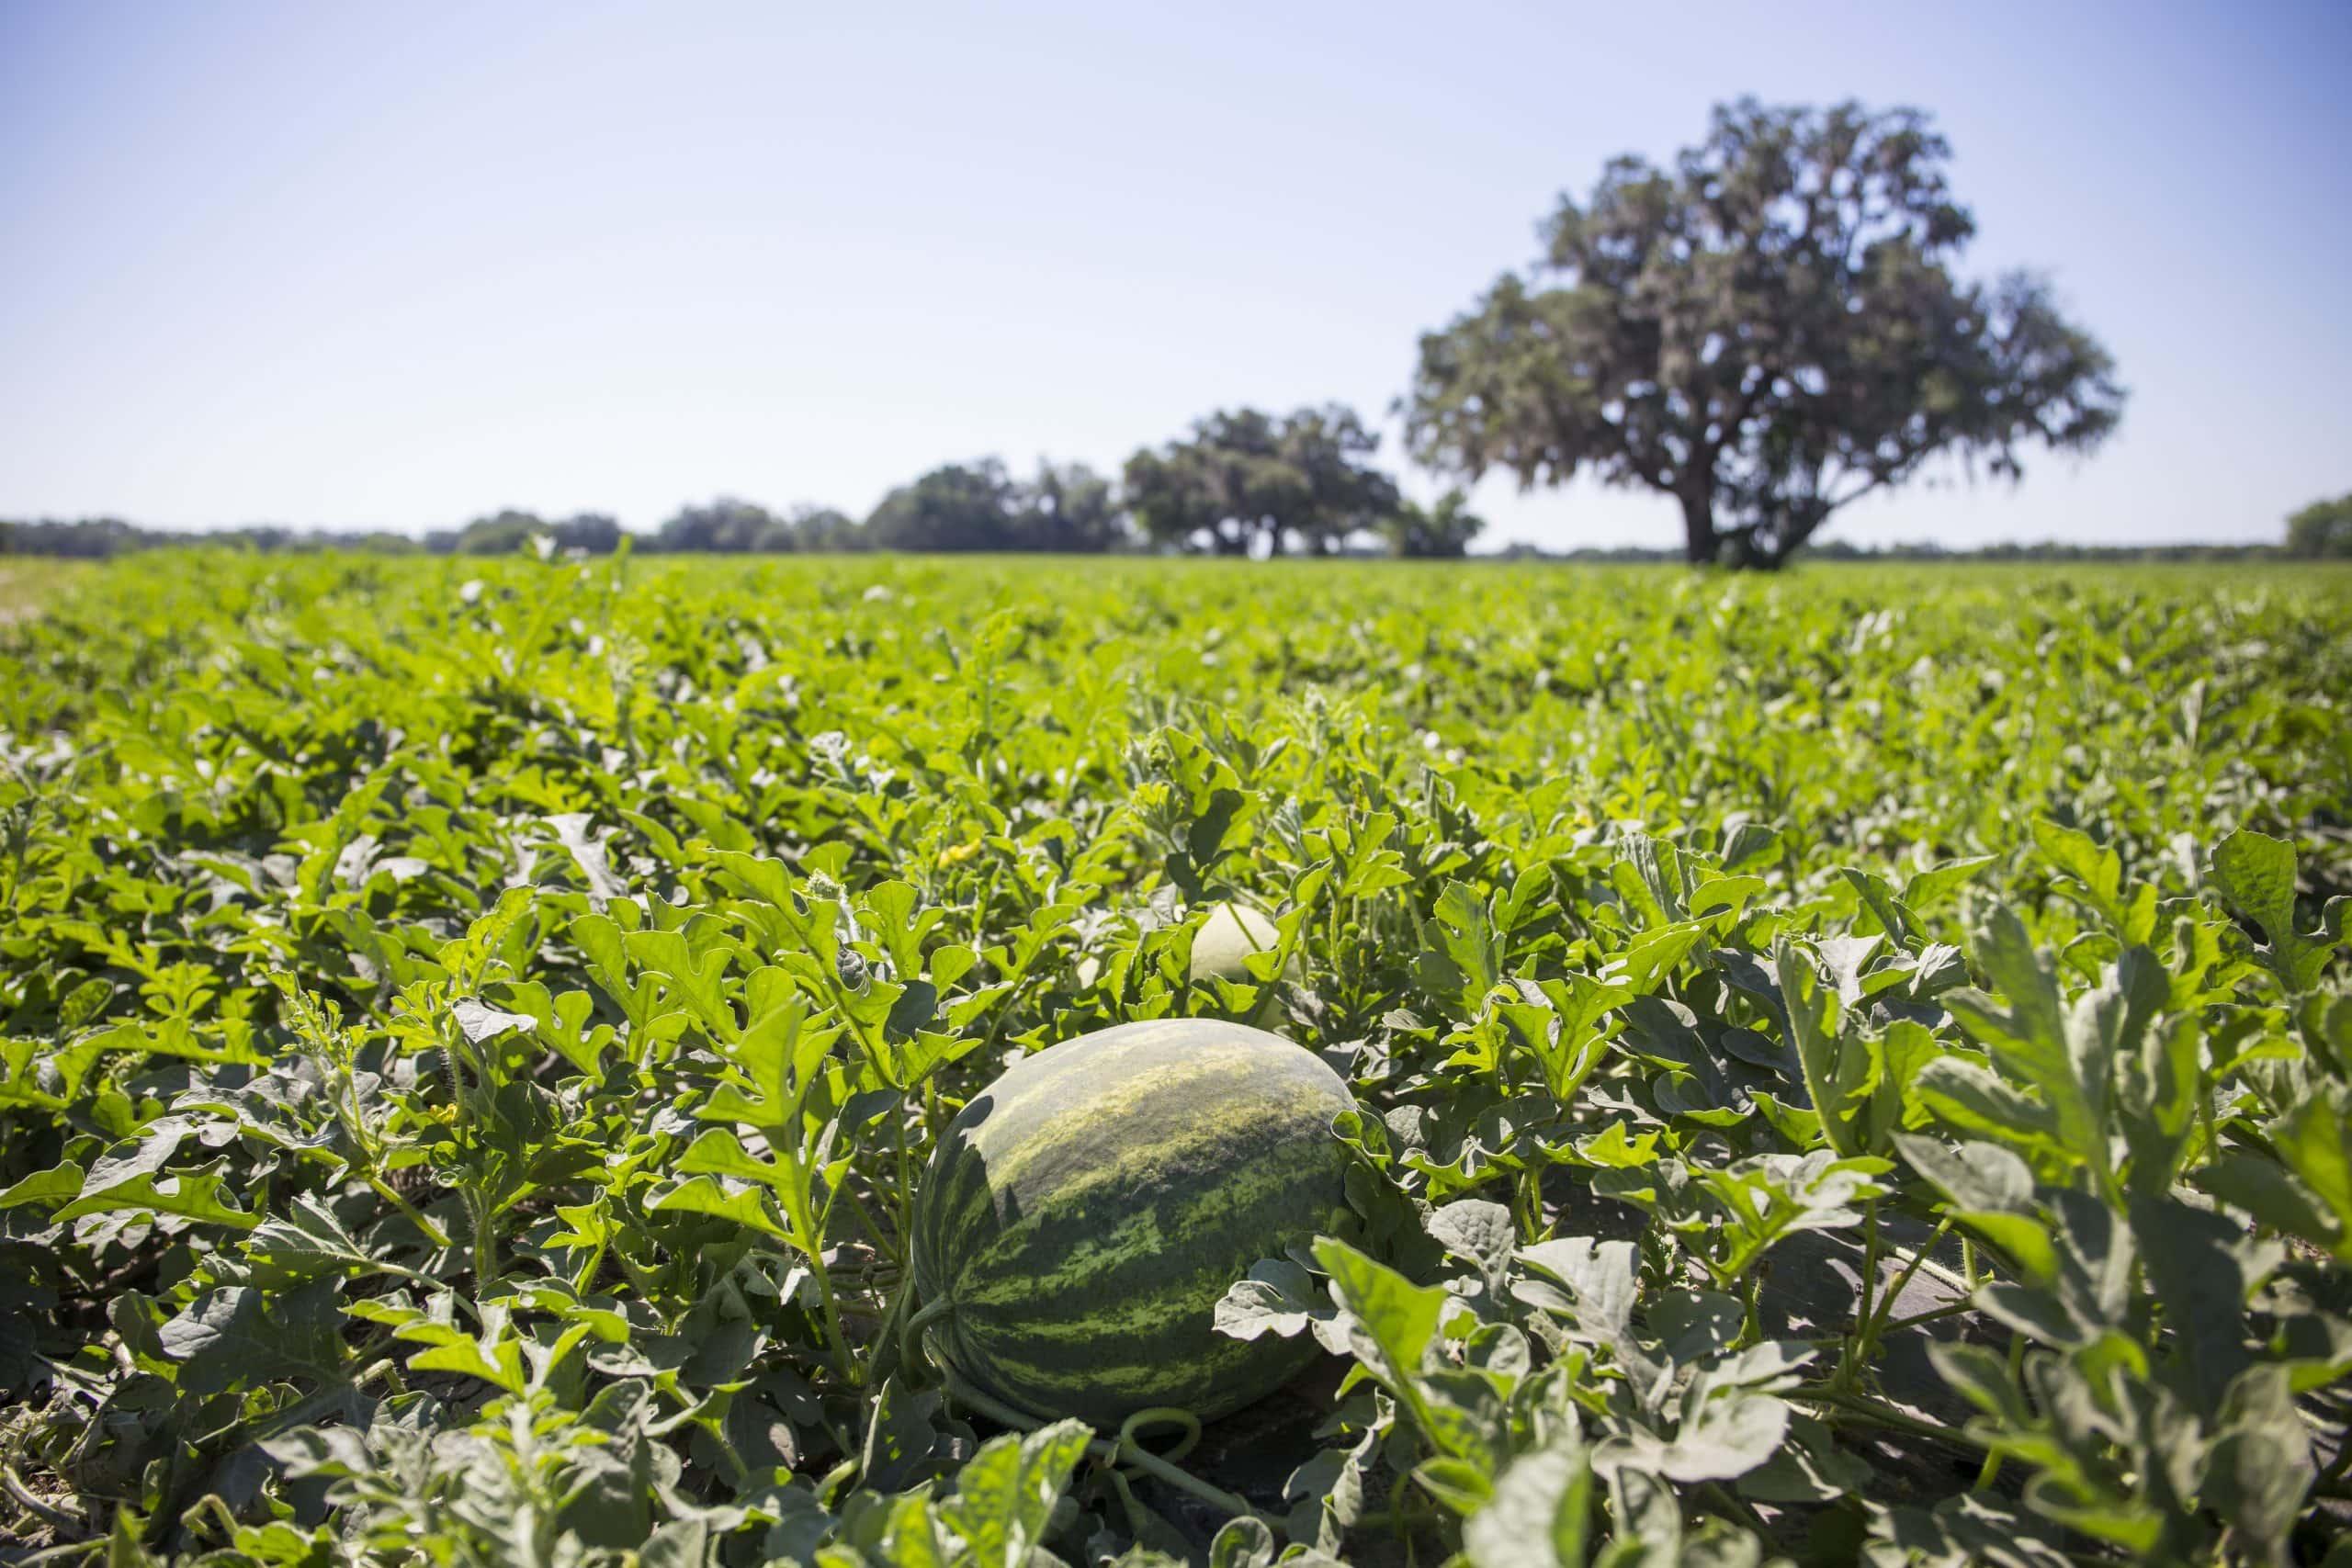 watermelon-in-field-UF-IFAS-scaled-1.jpg